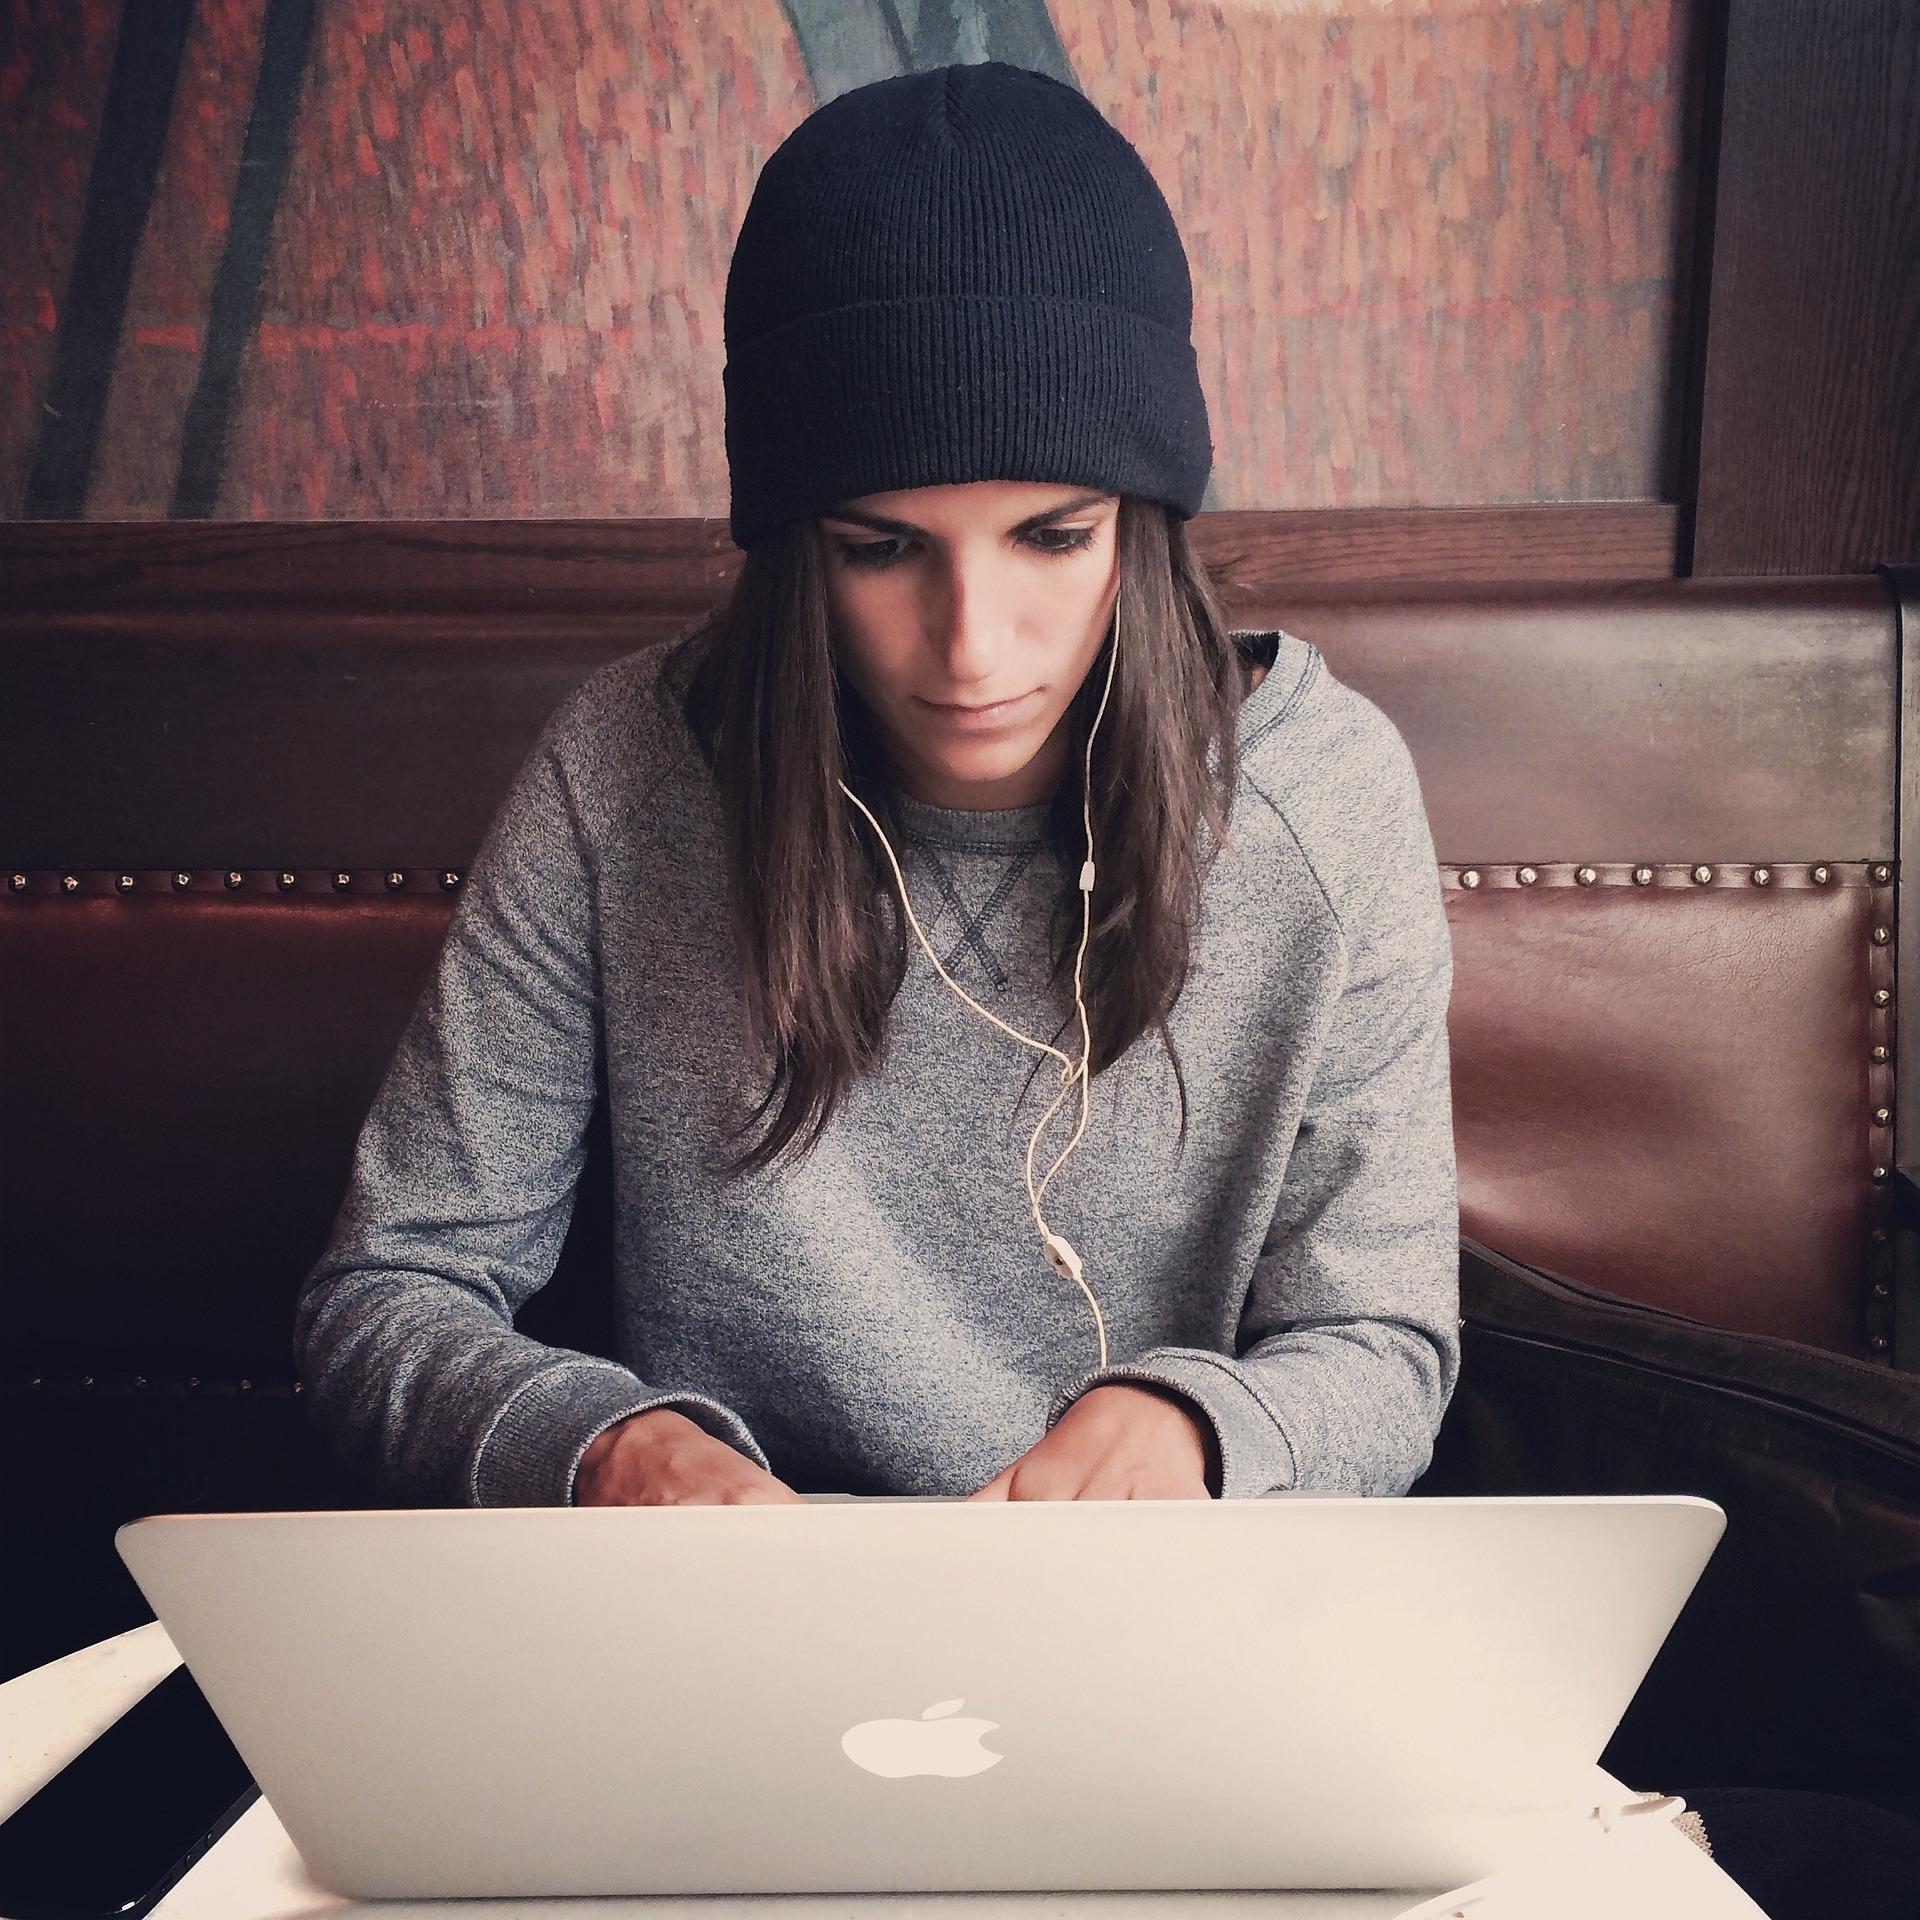 laptop-2561018_1920.jpg